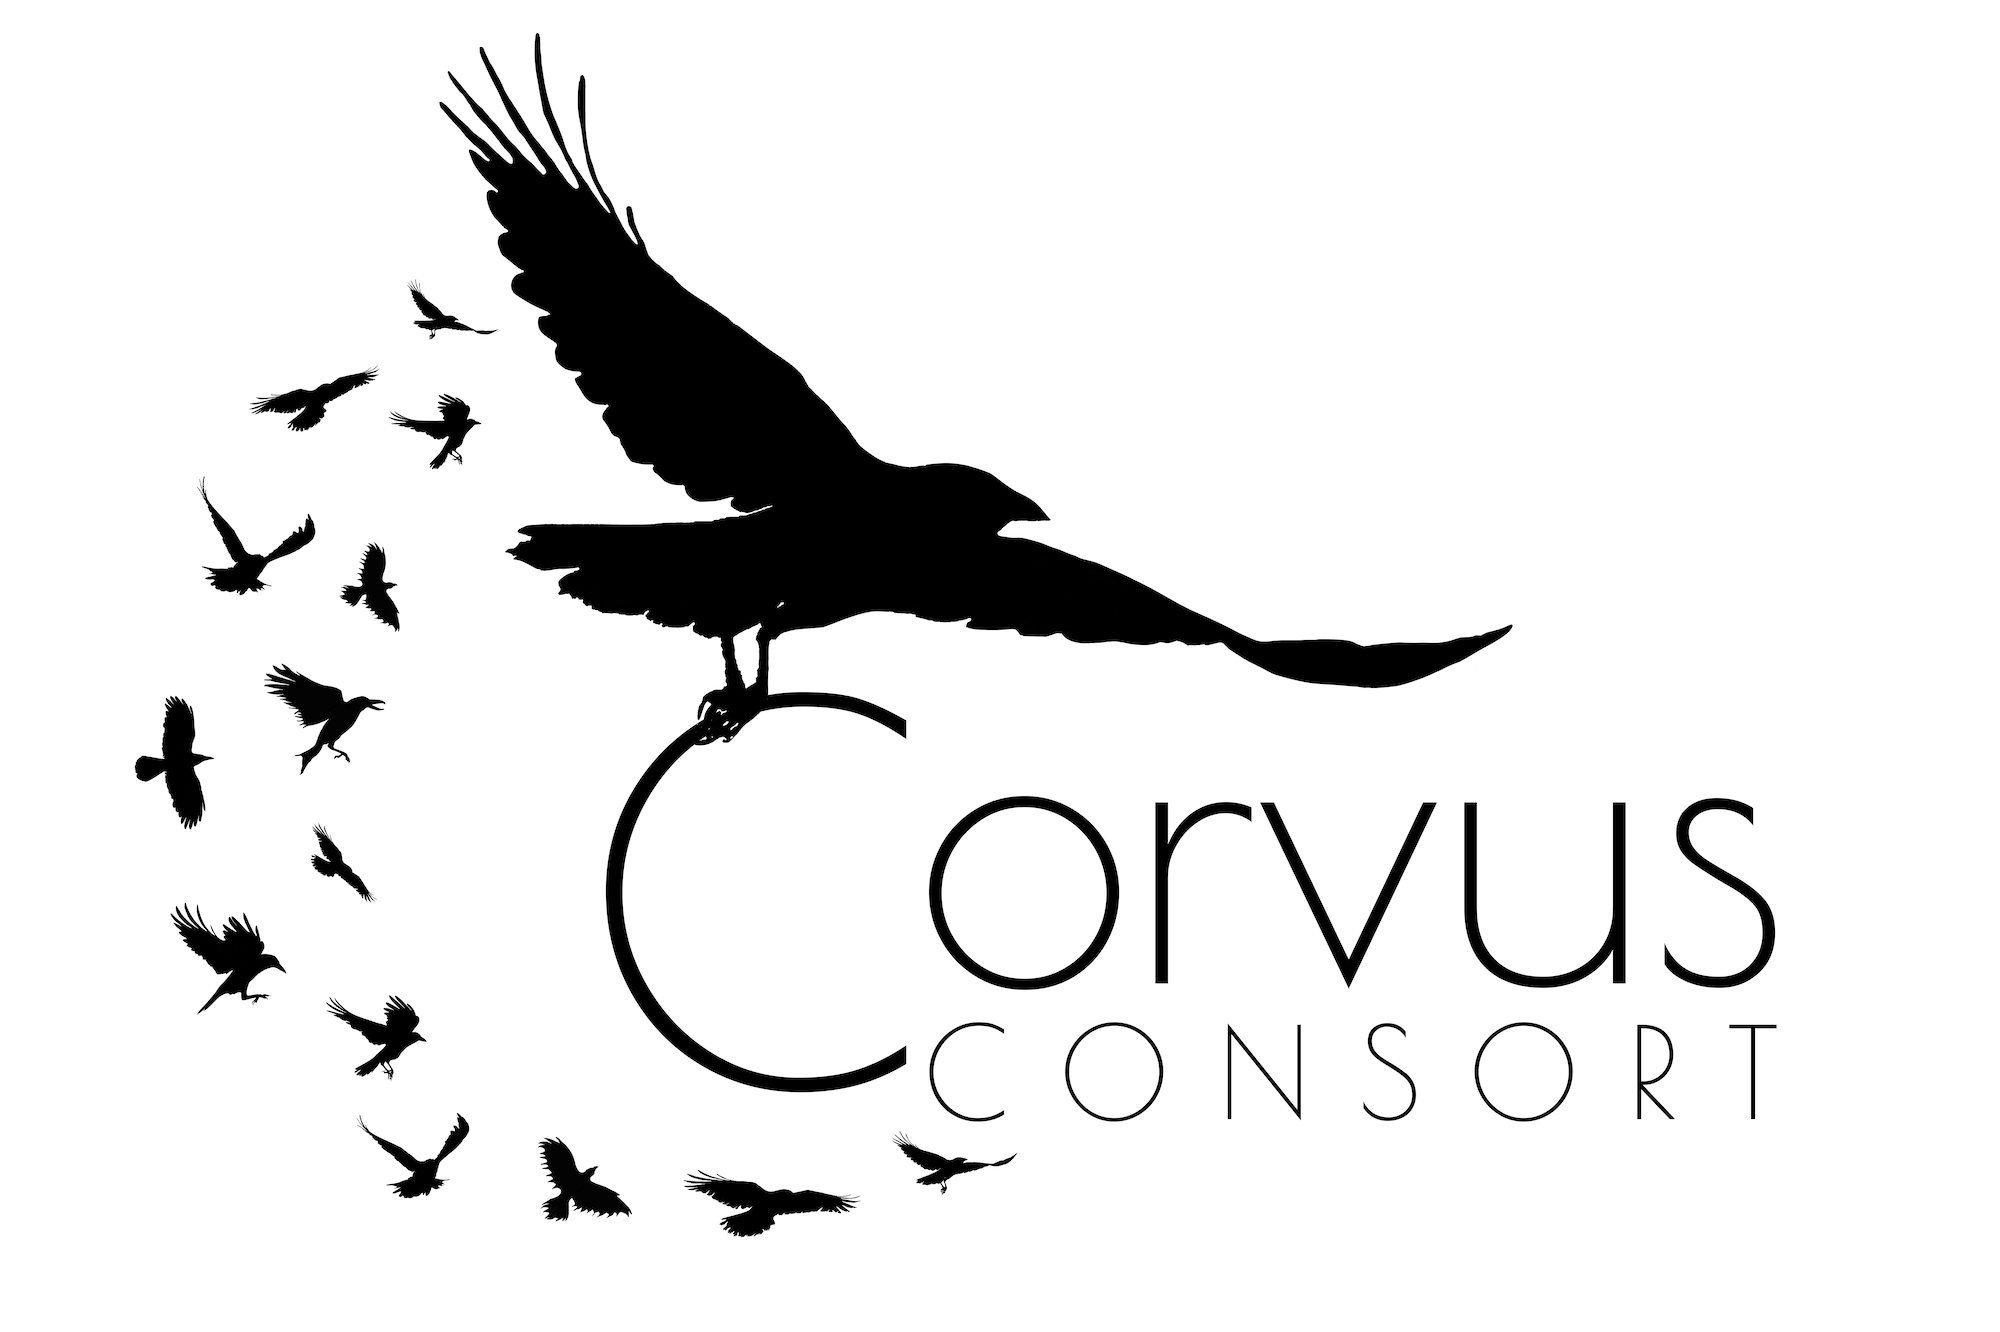 Corvus Consort